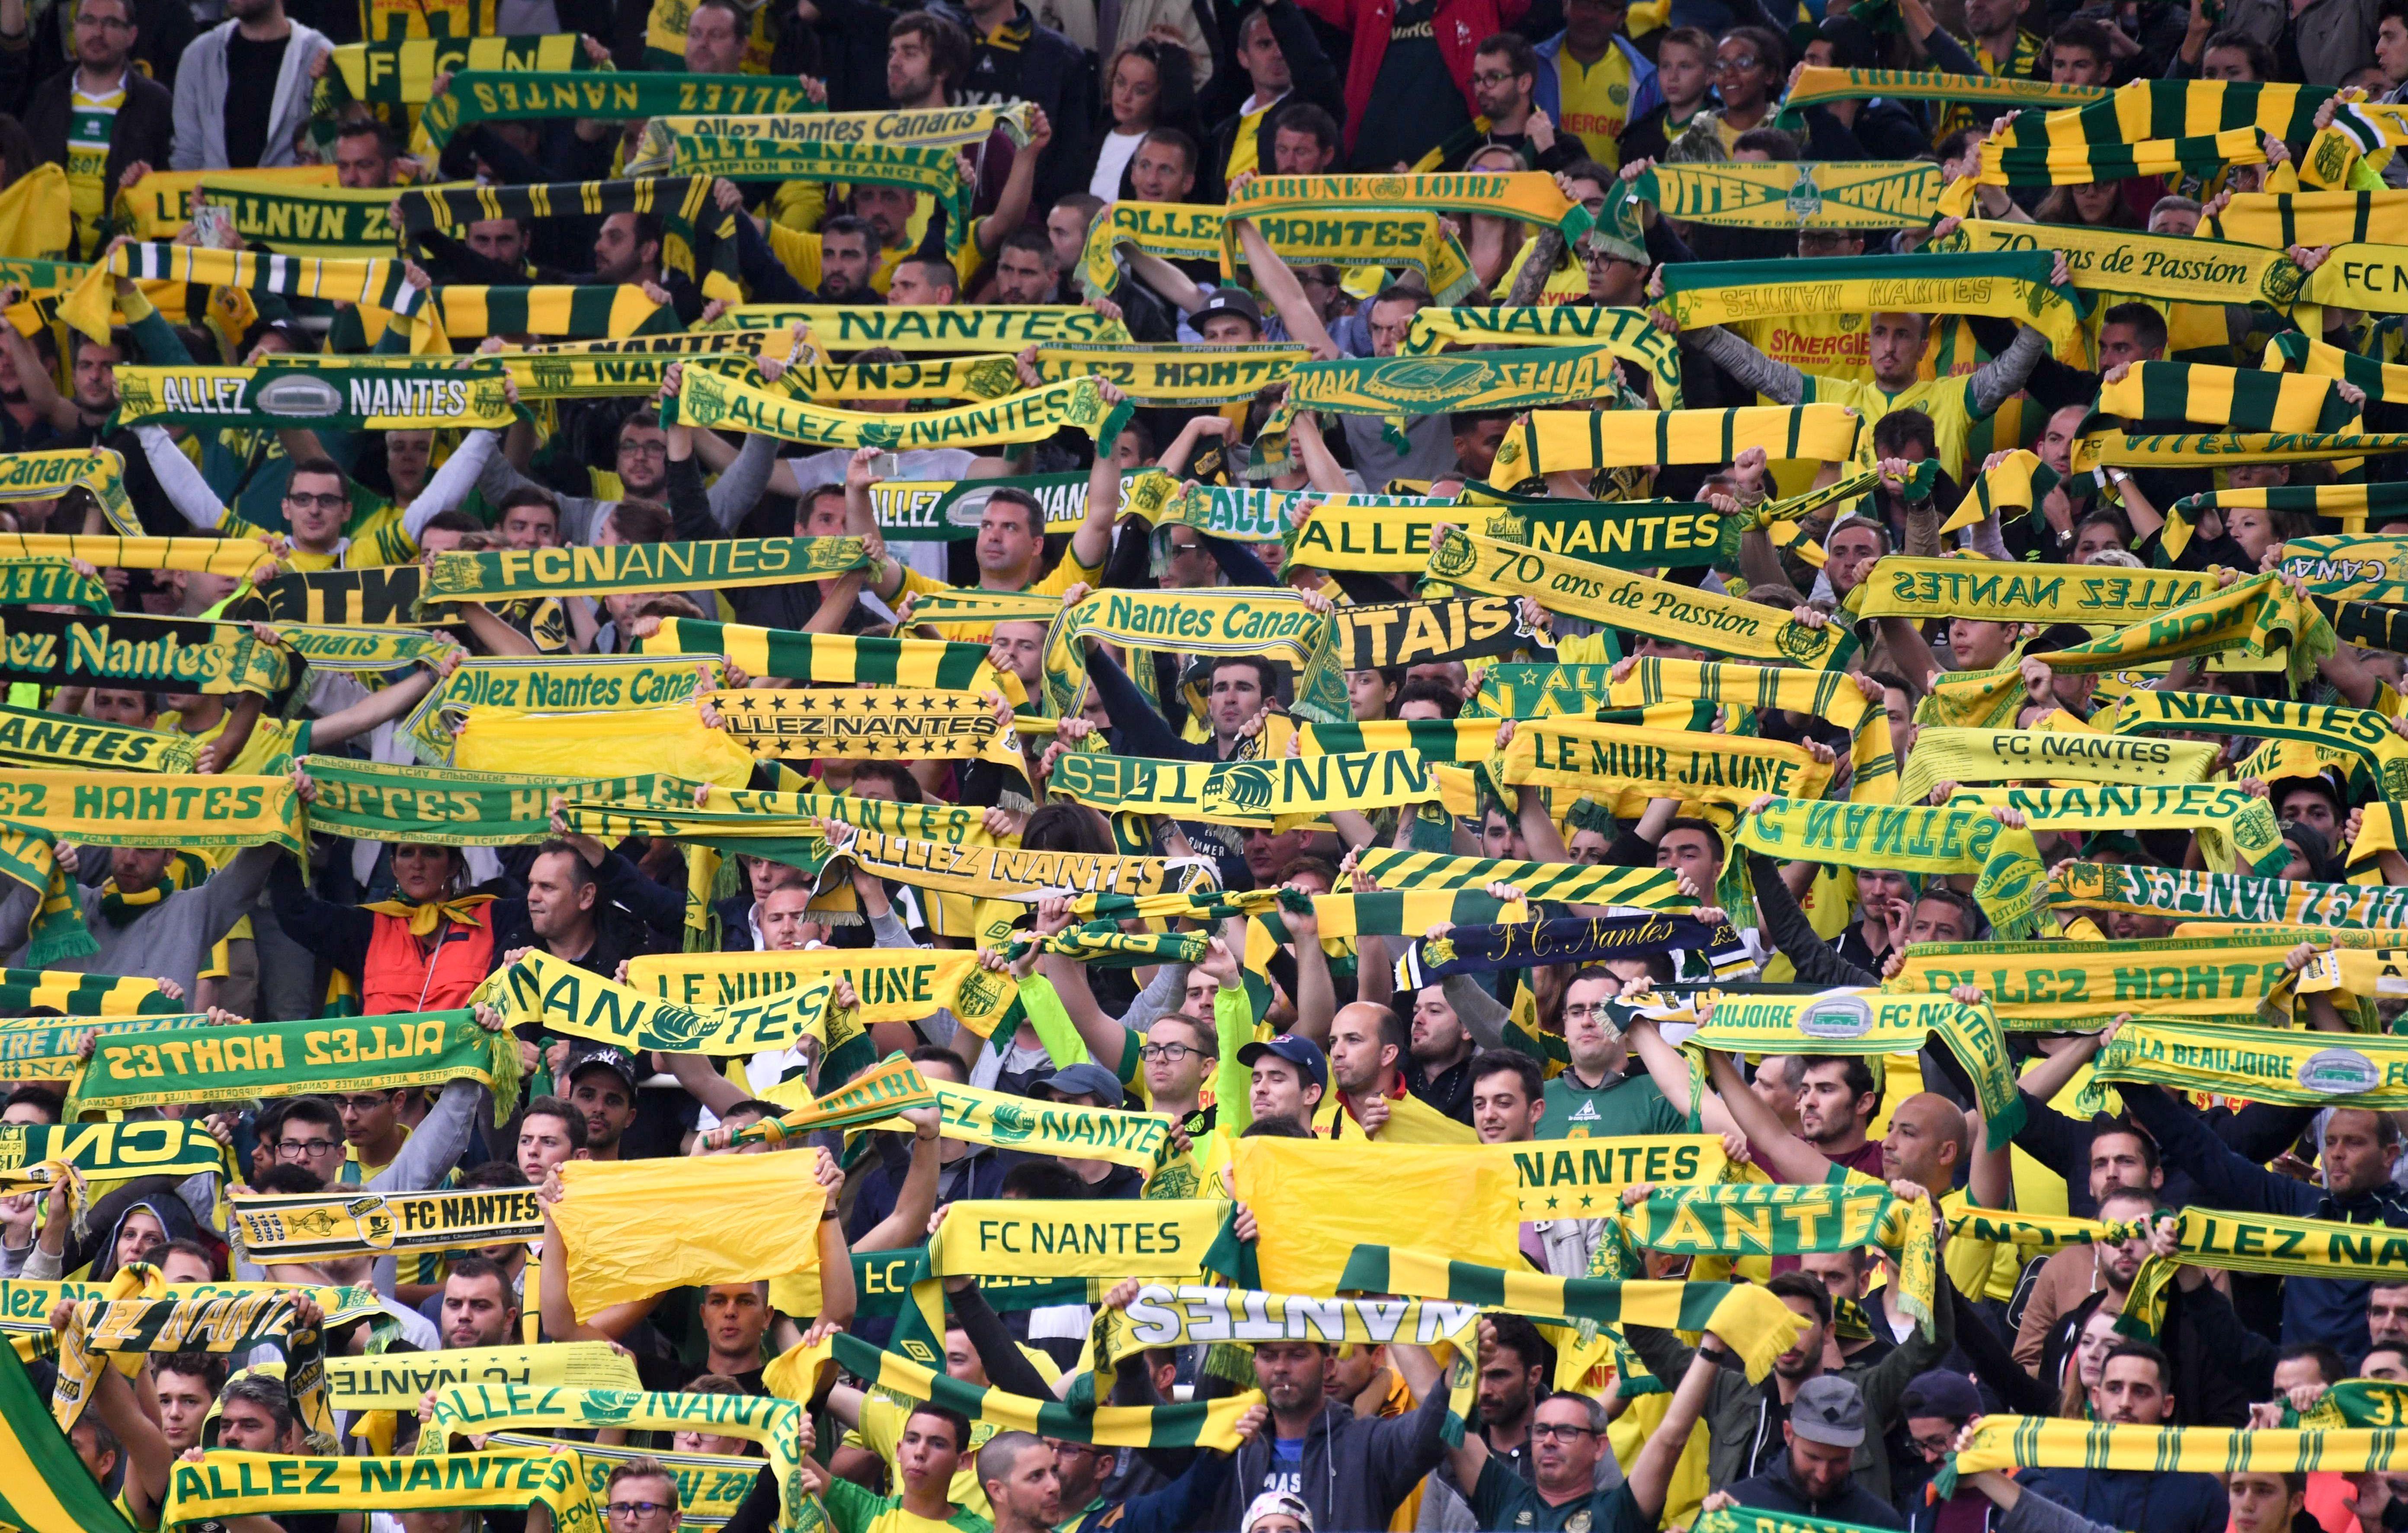 Football - Ligue 1 - Adieu La Beaujoire, Nantes aura un nouveau stade en 2022